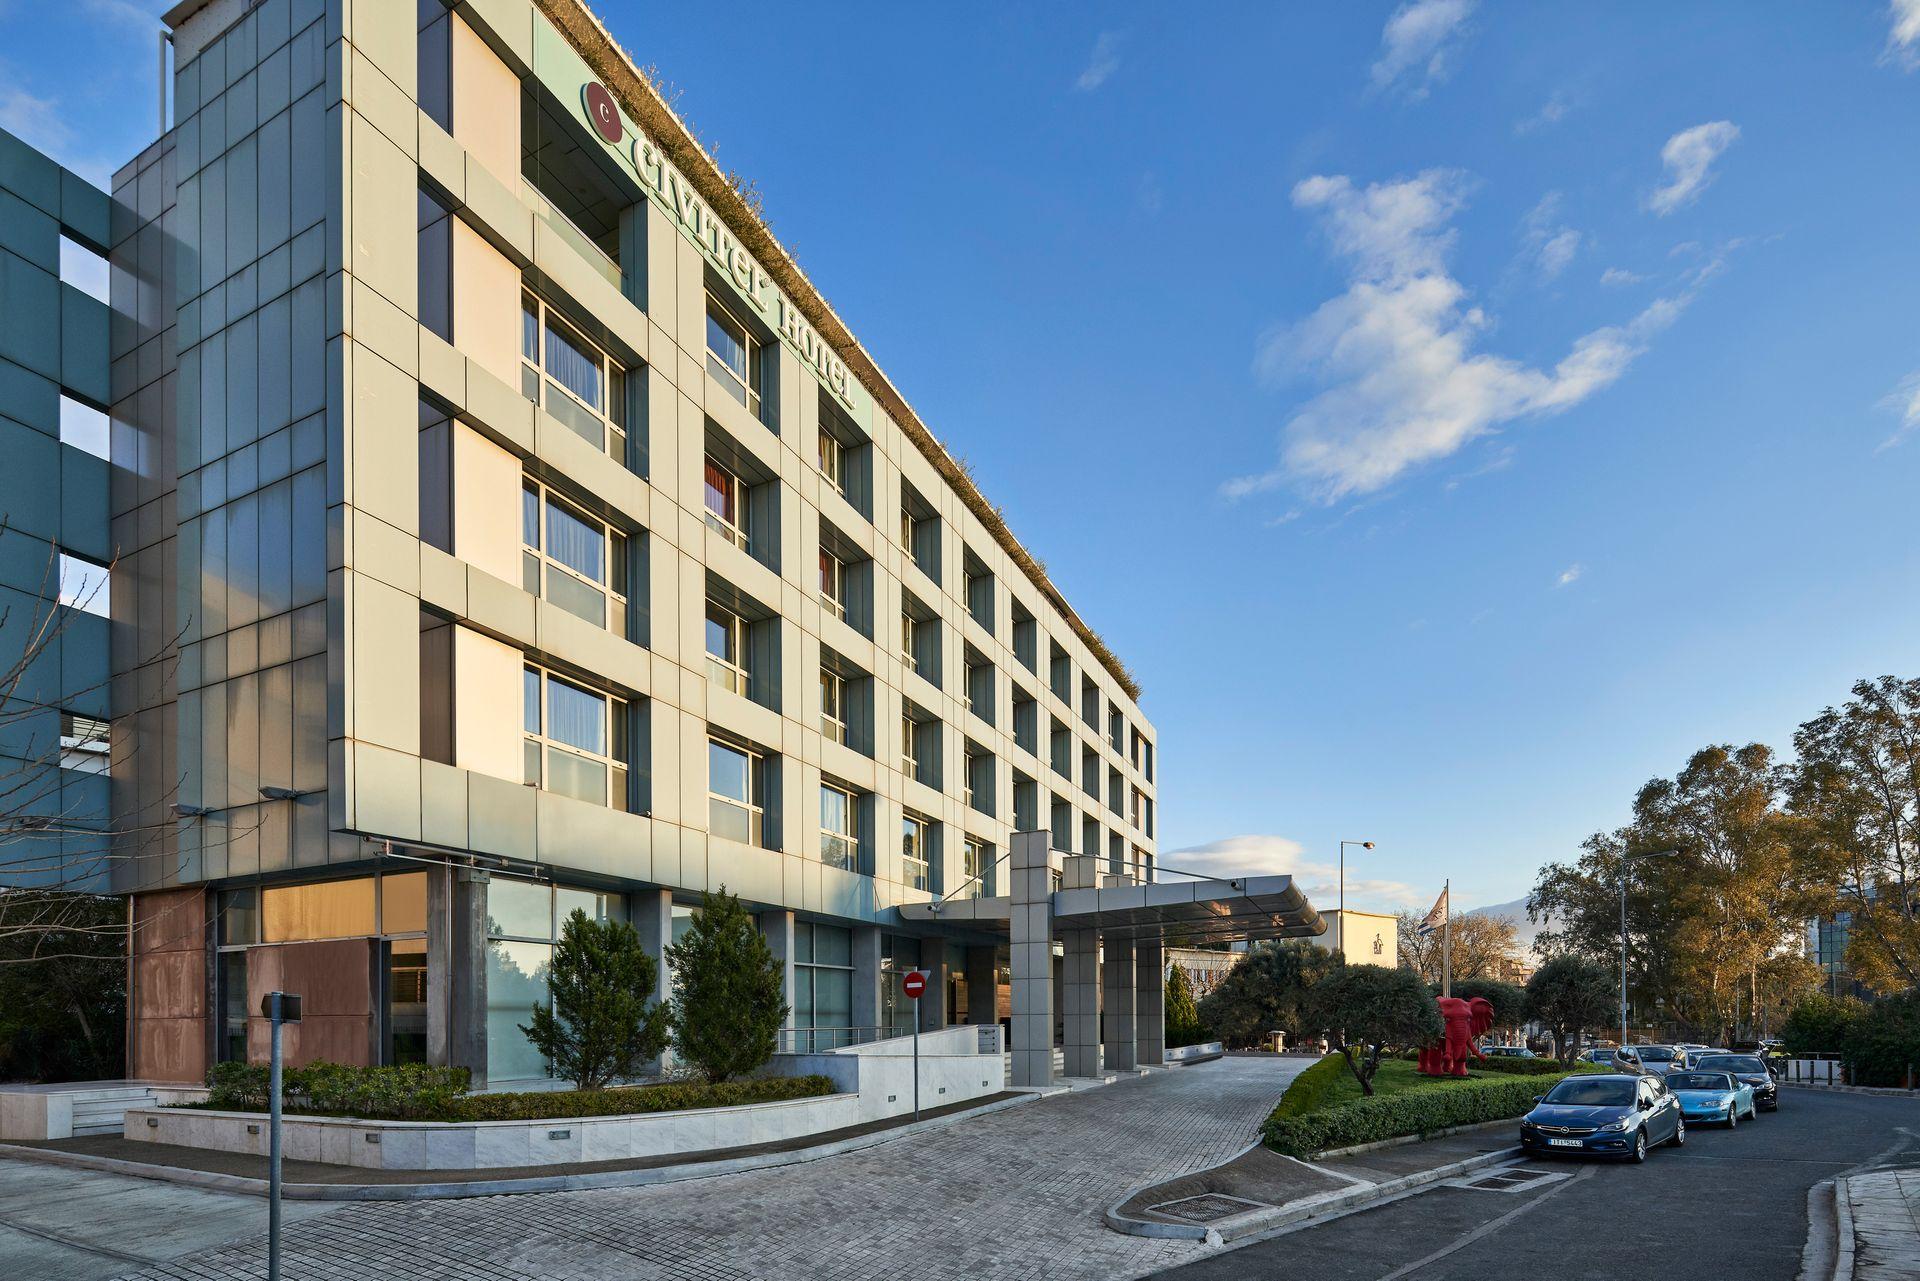 4* Civitel Olympic Hotel - Αθήνα ✦ -4% ✦ 2 Ημέρες (1 Διανυκτέρευση) ✦ 2 άτομα ✦ Χωρίς Πρωινό ✦ έως 31/08/2022 ✦ Θαυμάσια Τοποθεσία!